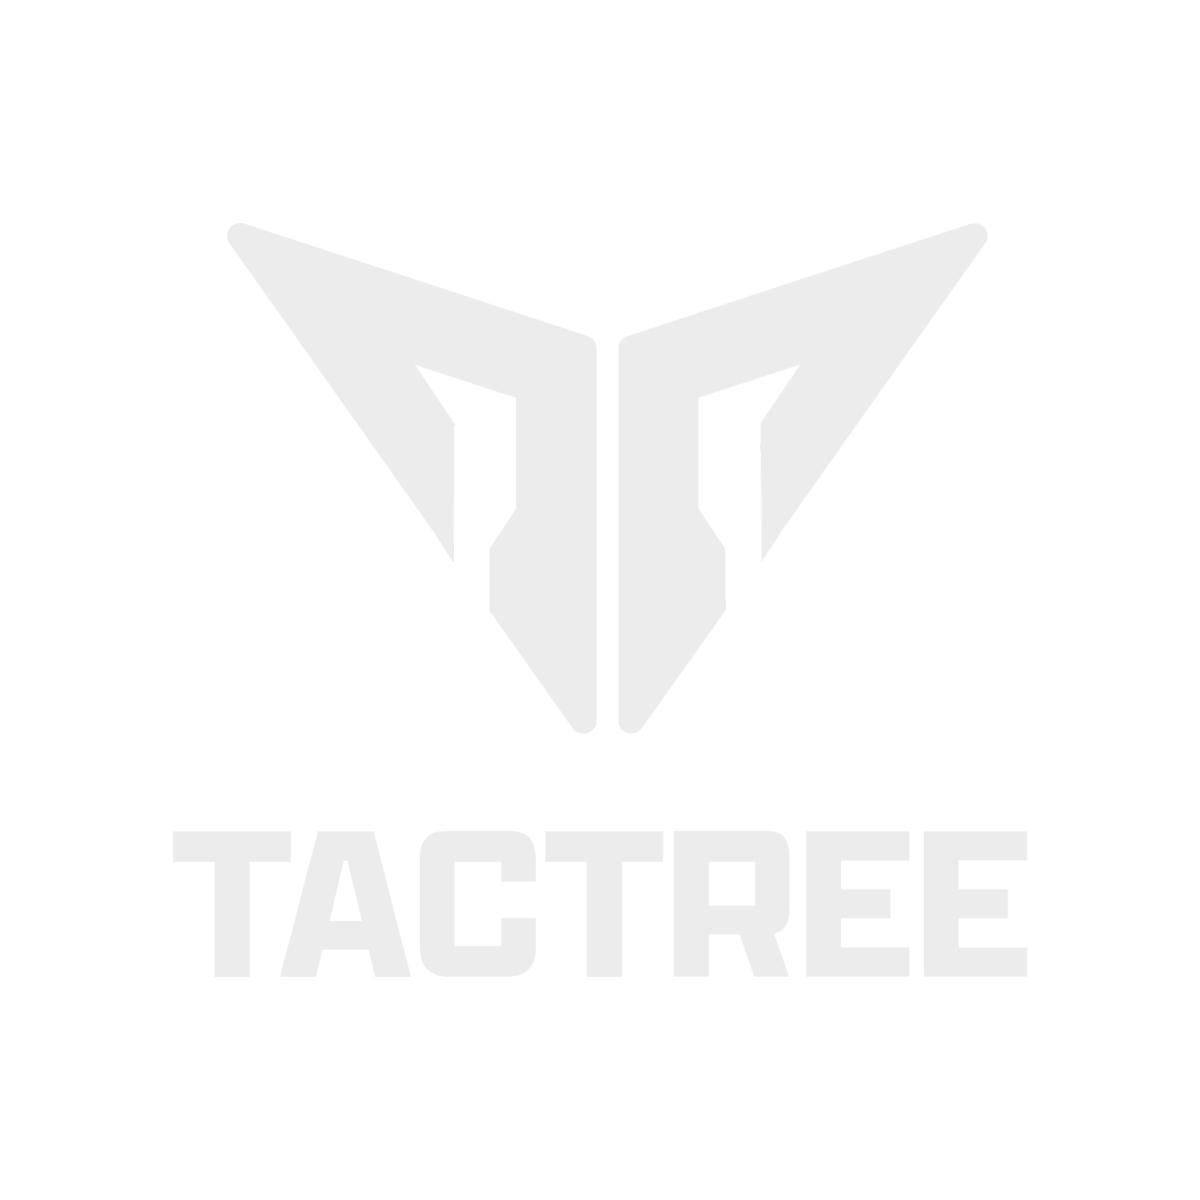 5.11 Taclite TDU Trousers